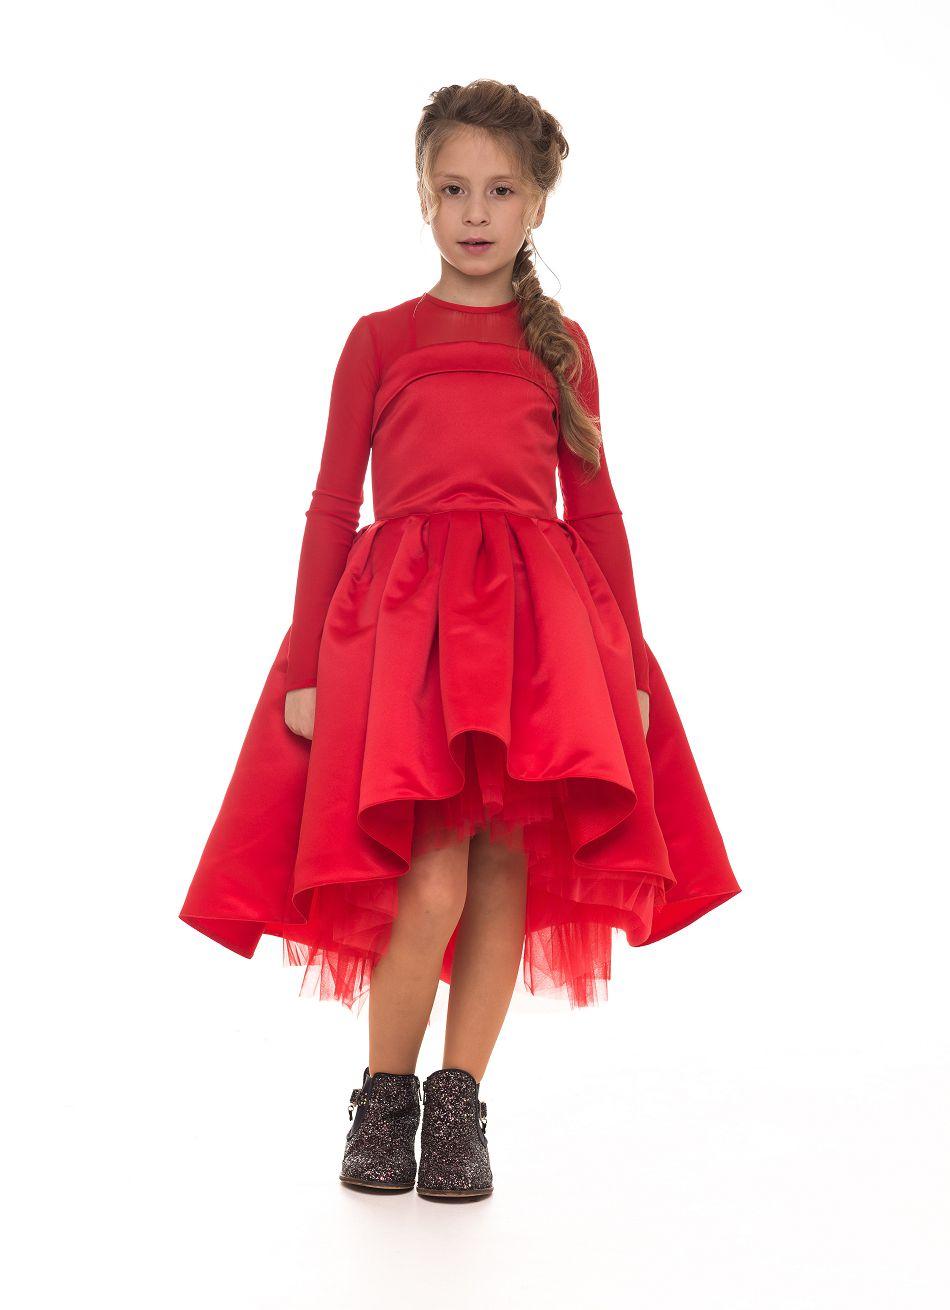 Святкова червона сукня на дівчинку від Malyna  дизайнерское платье девочке  красное ... 400f6cef21d13